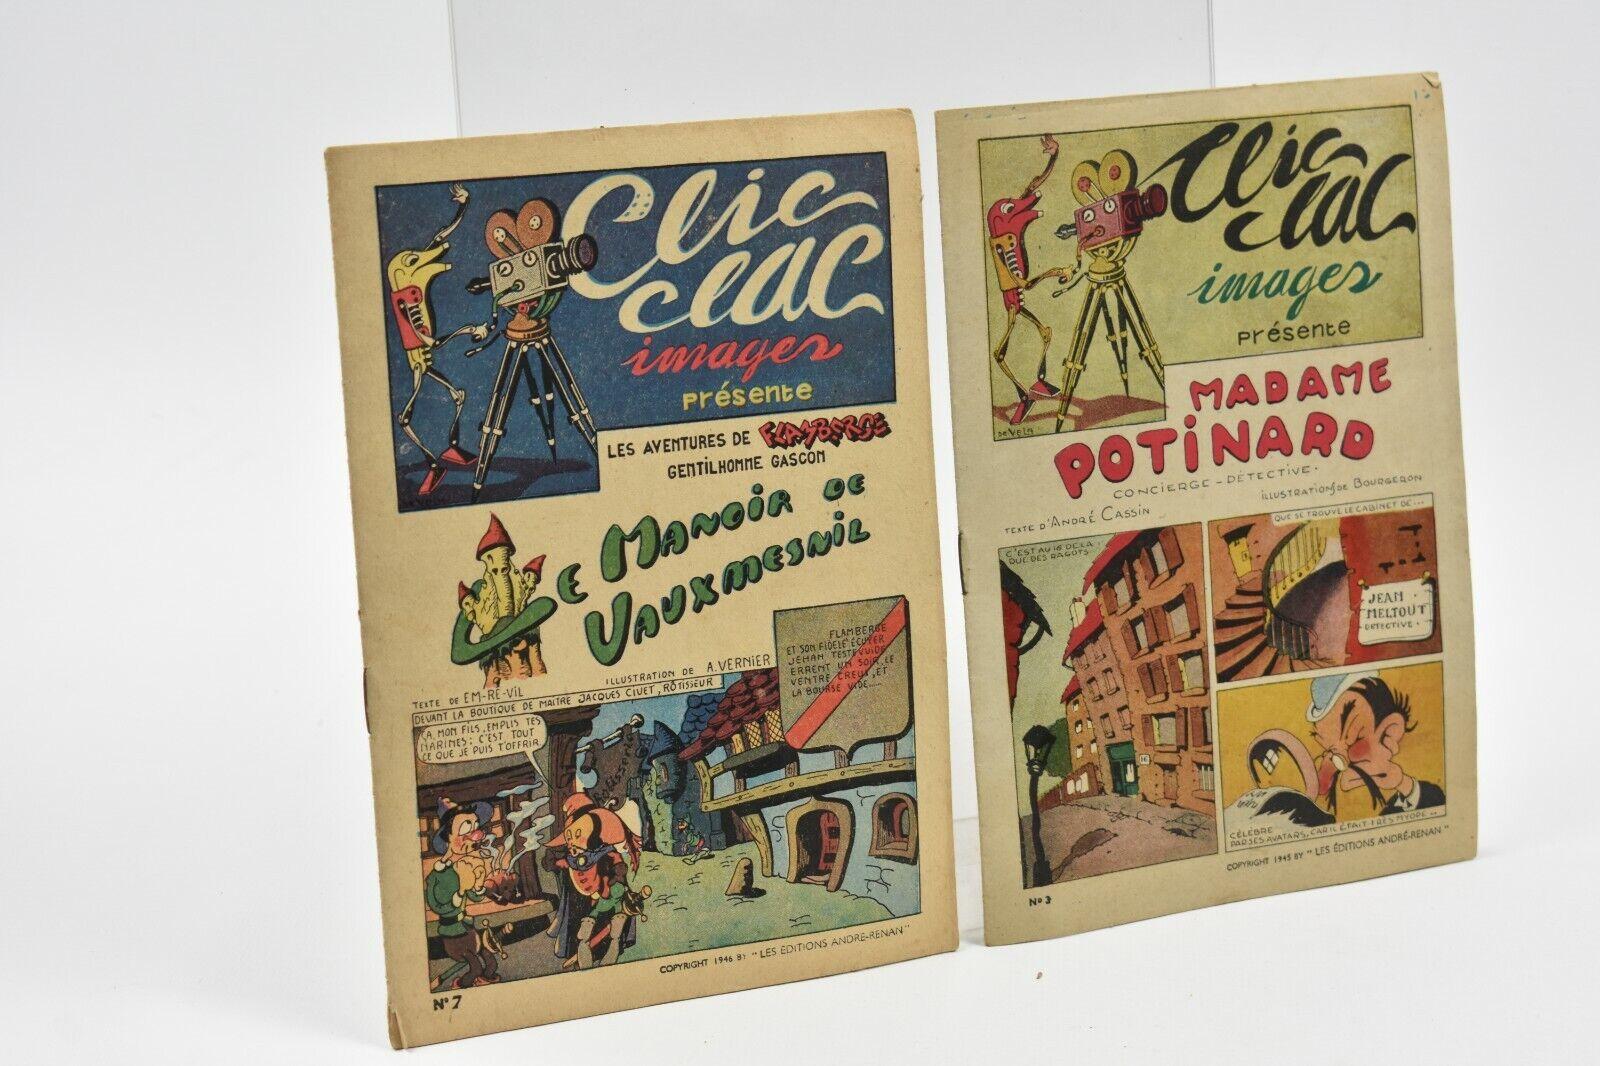 Clic clac images le manoir de vauxmesnil/madame potinard n°7-3